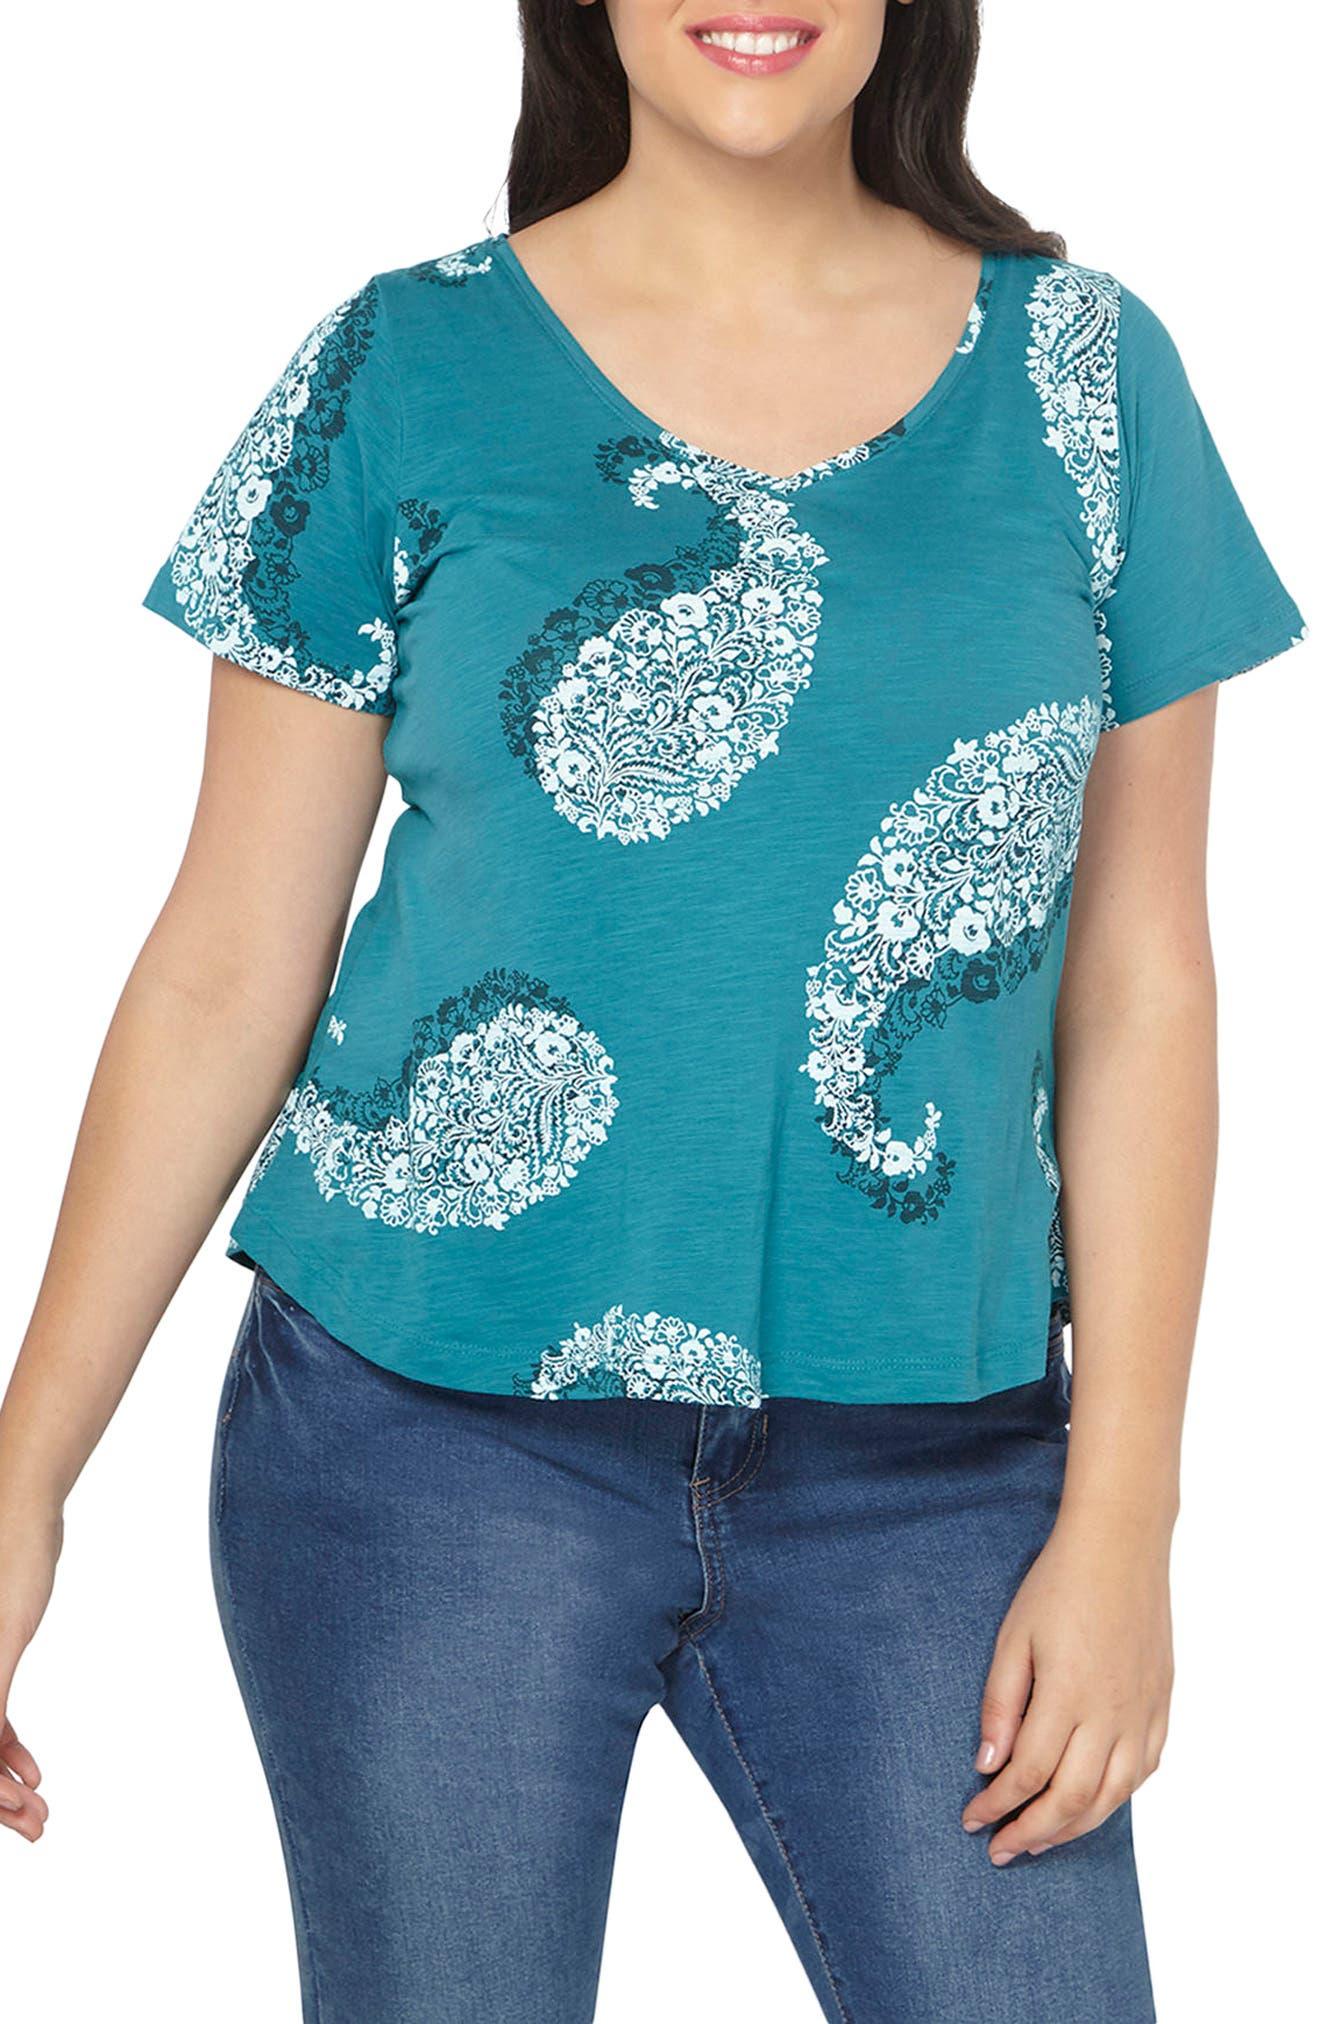 Alternate Image 1 Selected - Evan Paisley Short Sleeve Shirt (Plus Size)